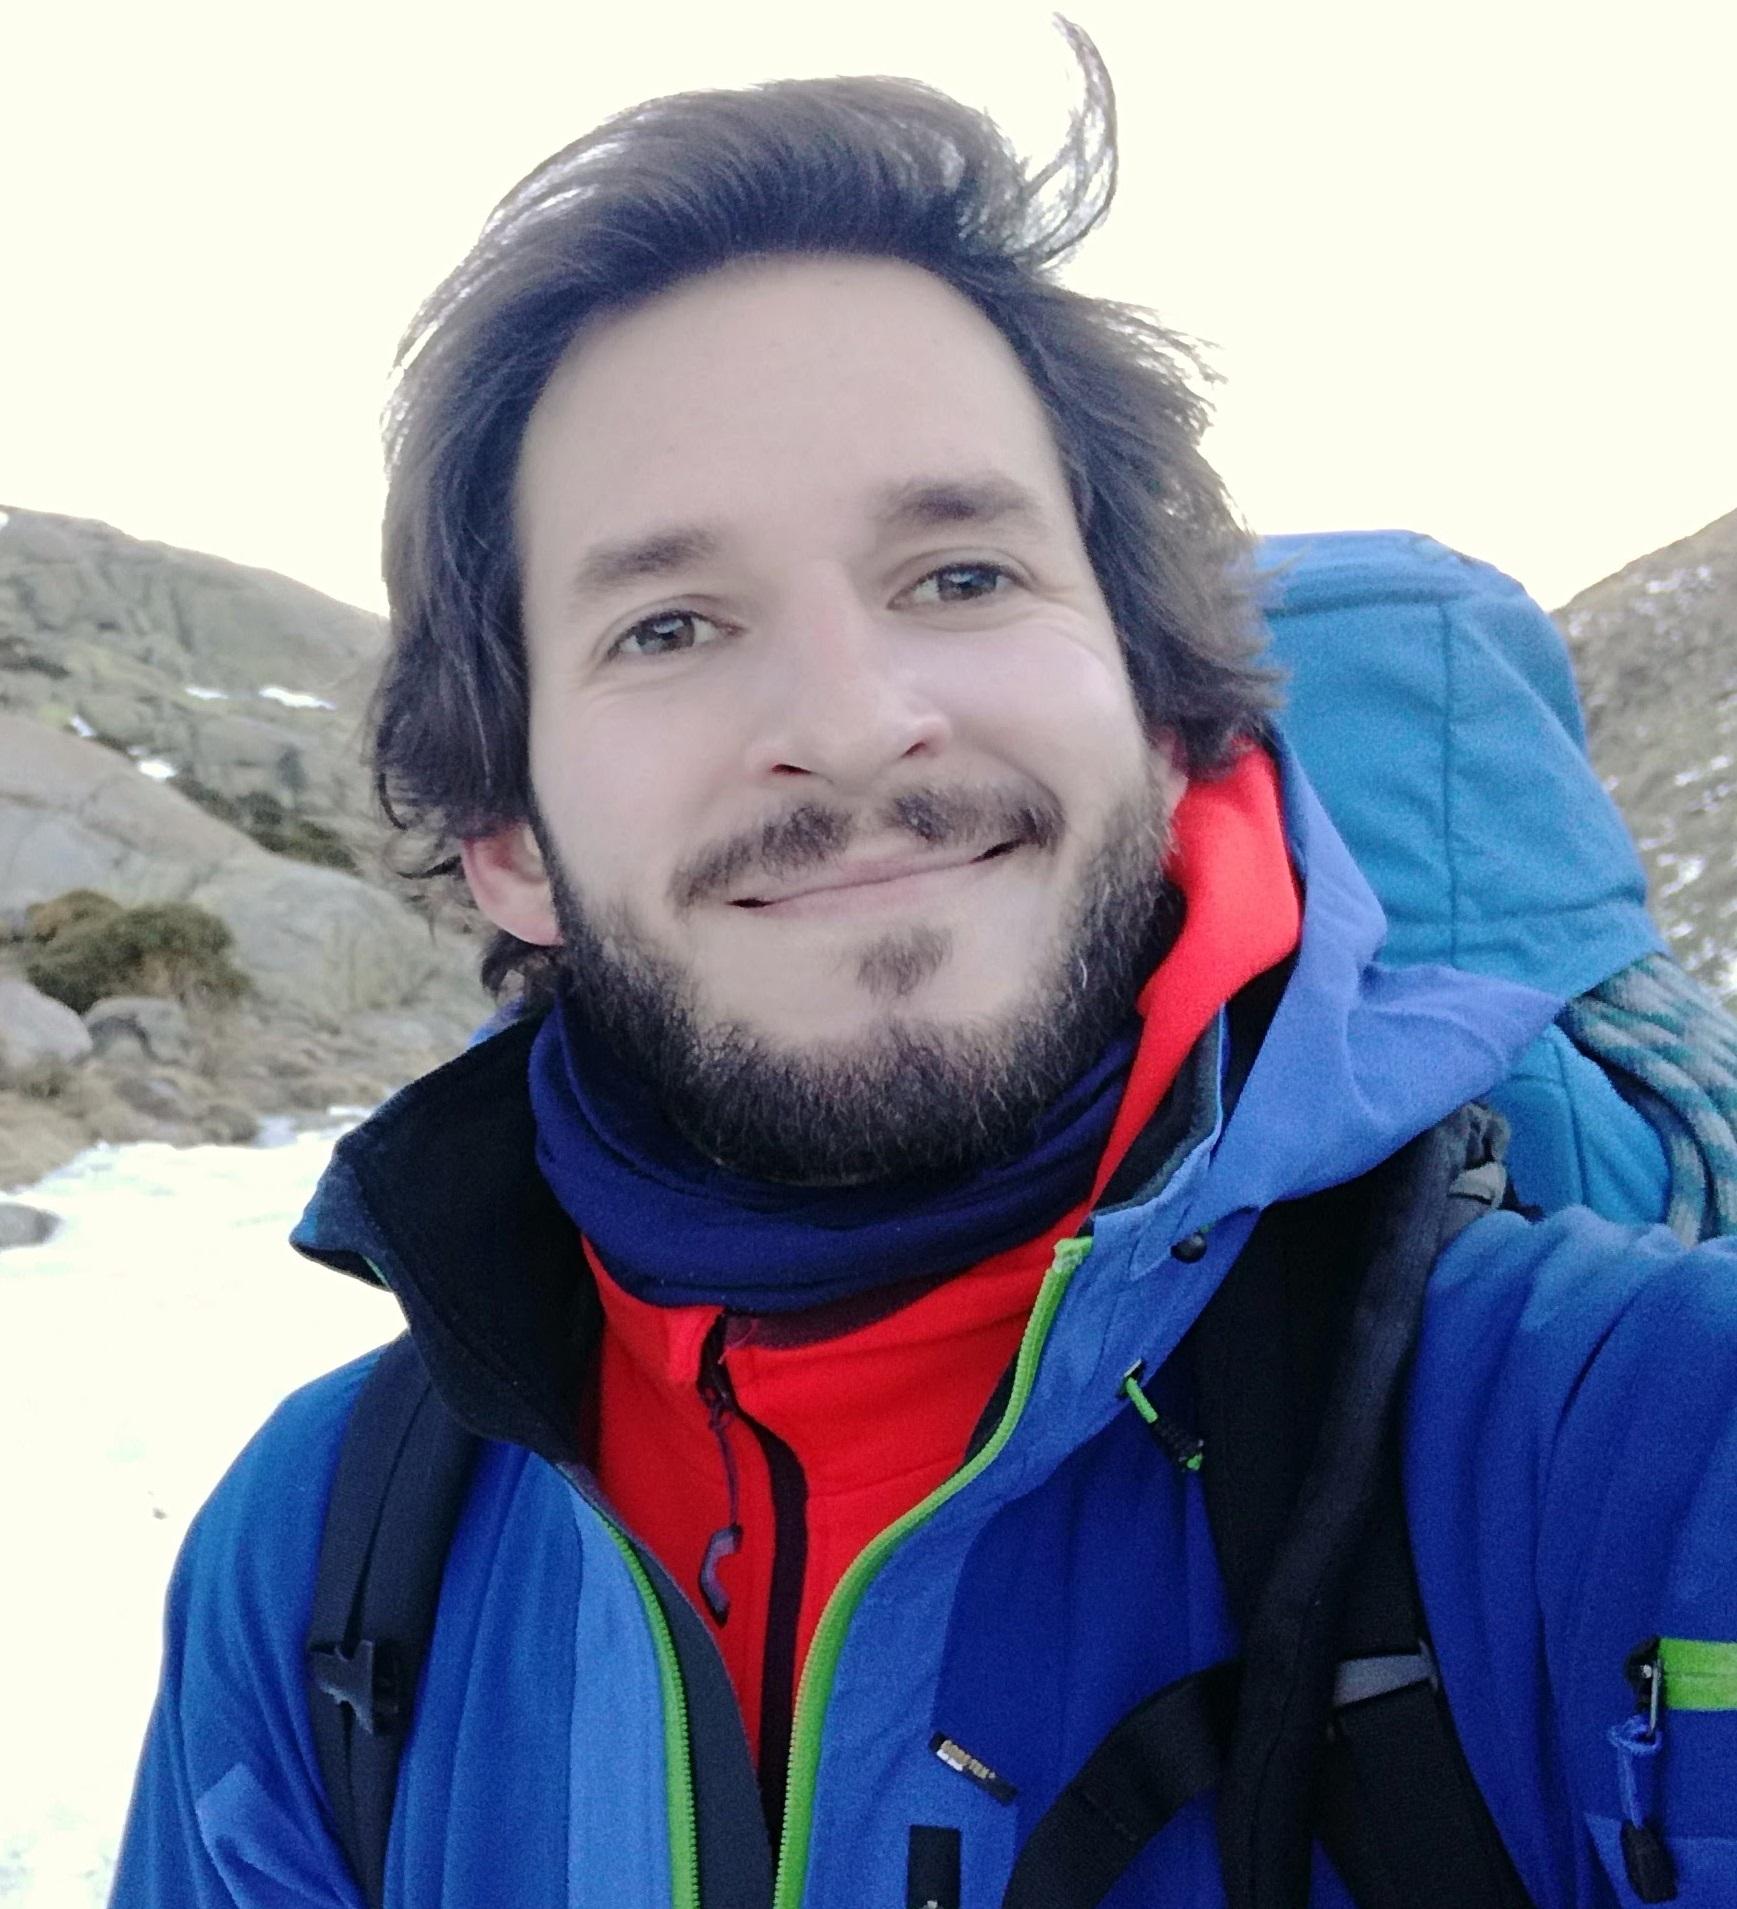 Goncalo, privat Ski Instruktor für Ben&Joe's, privat Ski Schule in Klosters und Davos!